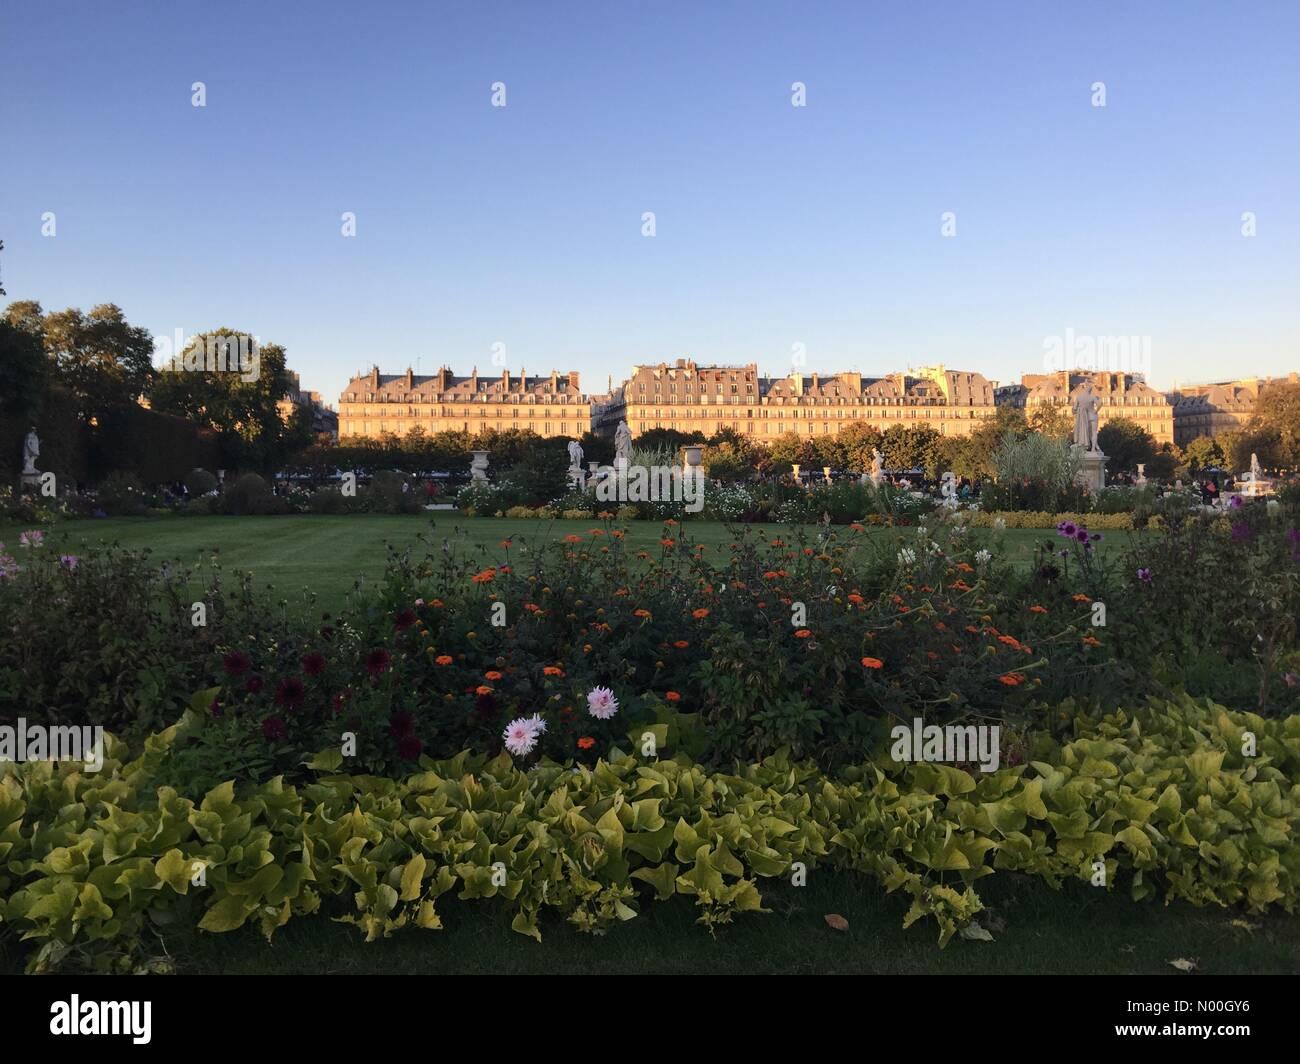 75001 Paris, France. 22nd Sep, 2017. Tuileries gardens sunset light, Paris Credit: InesAmd/StockimoNews/Alamy Live - Stock Image